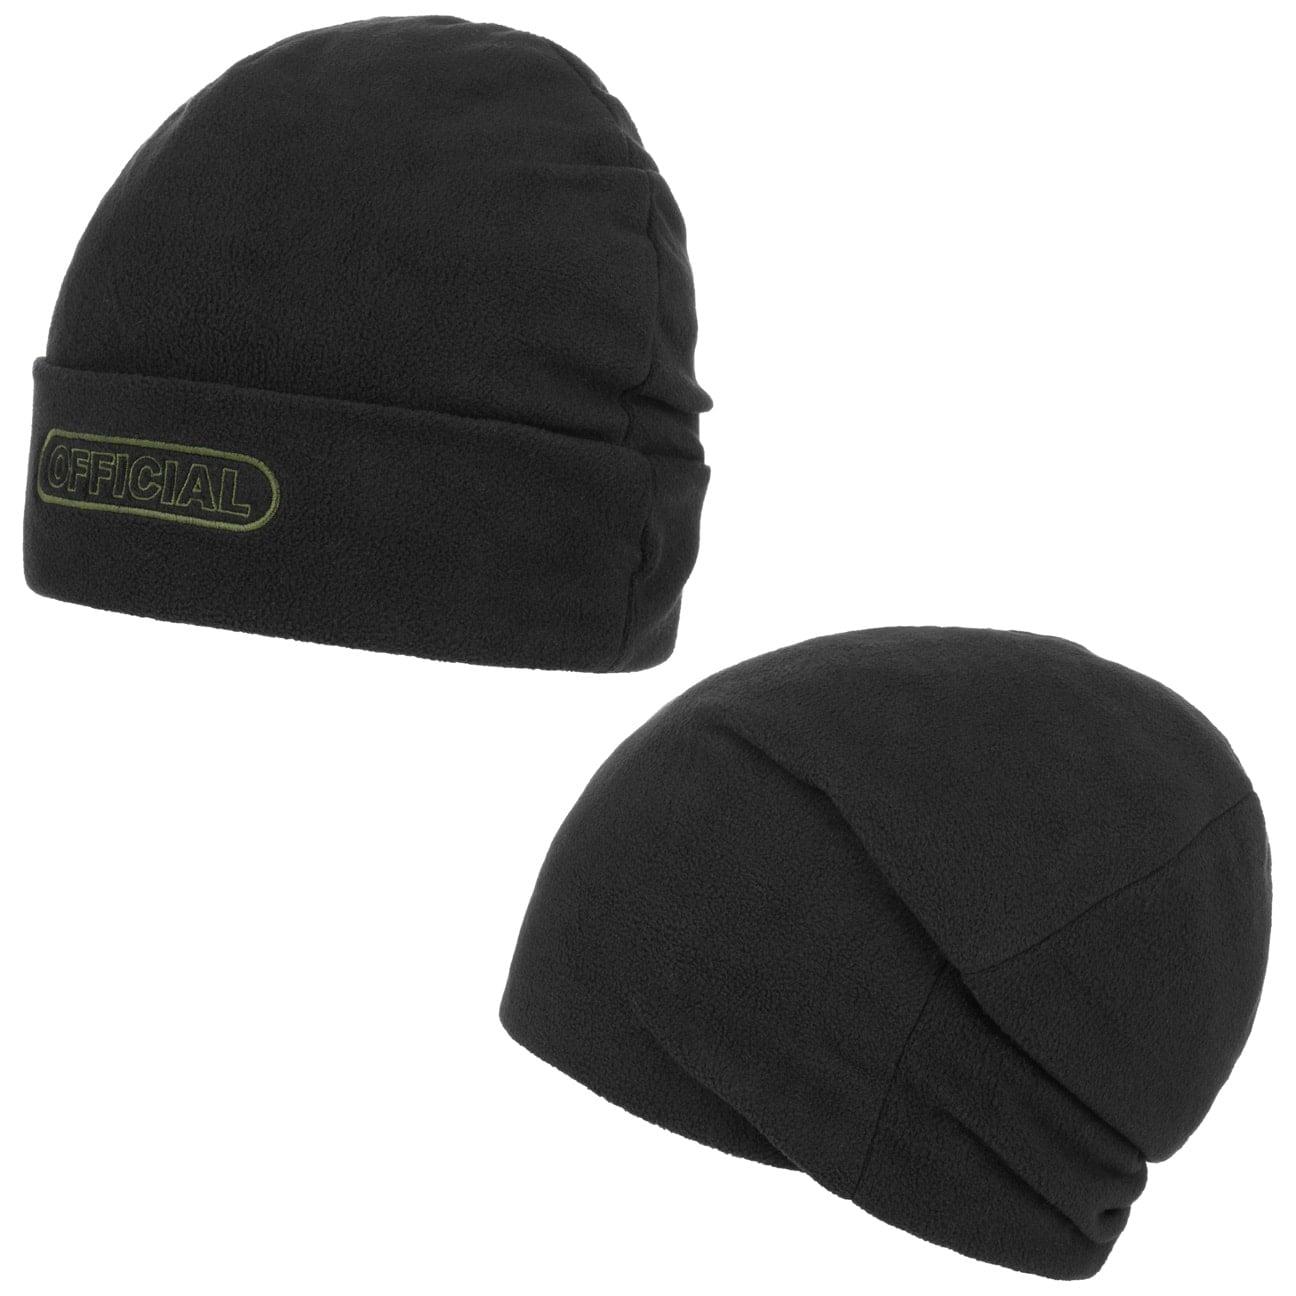 Bonnet Beanie Blackslope by Official Headwear  bonnet de grande taille